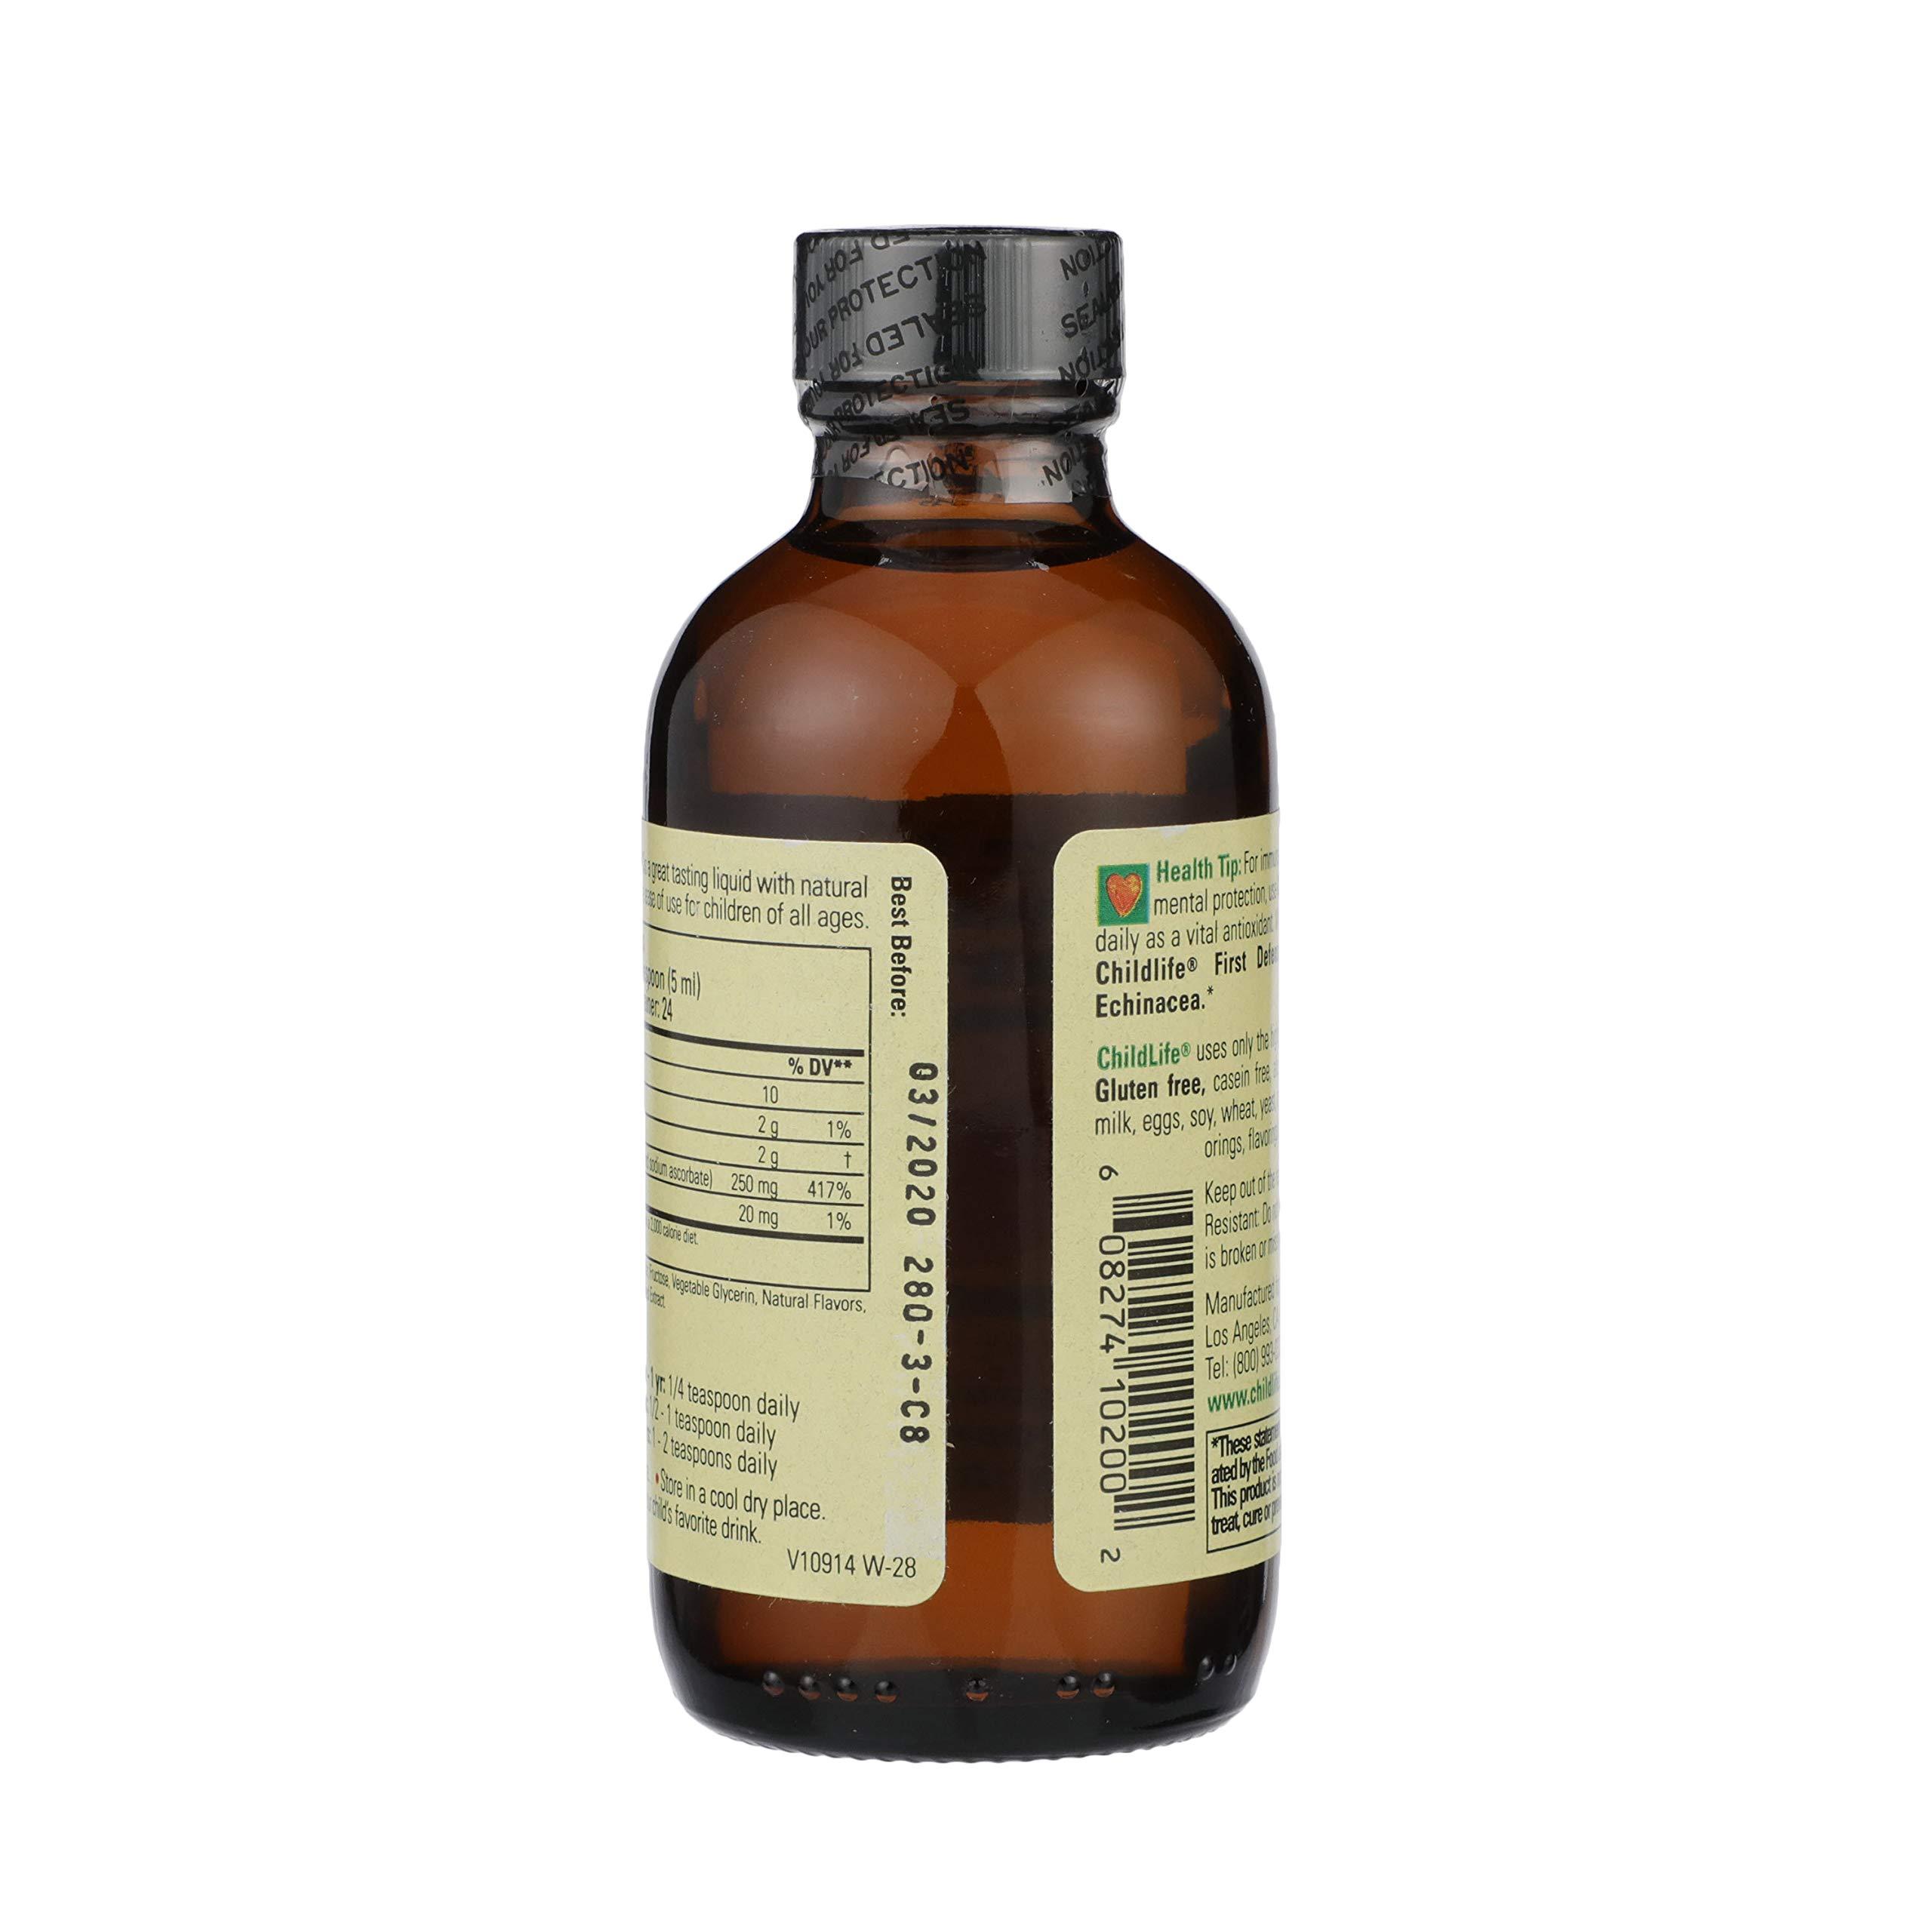 ChildLife Essentials Liquid Vitamin C Immune Support, for Infants, Babys, Kids, Toddlers, Children, and Teens, Orange…